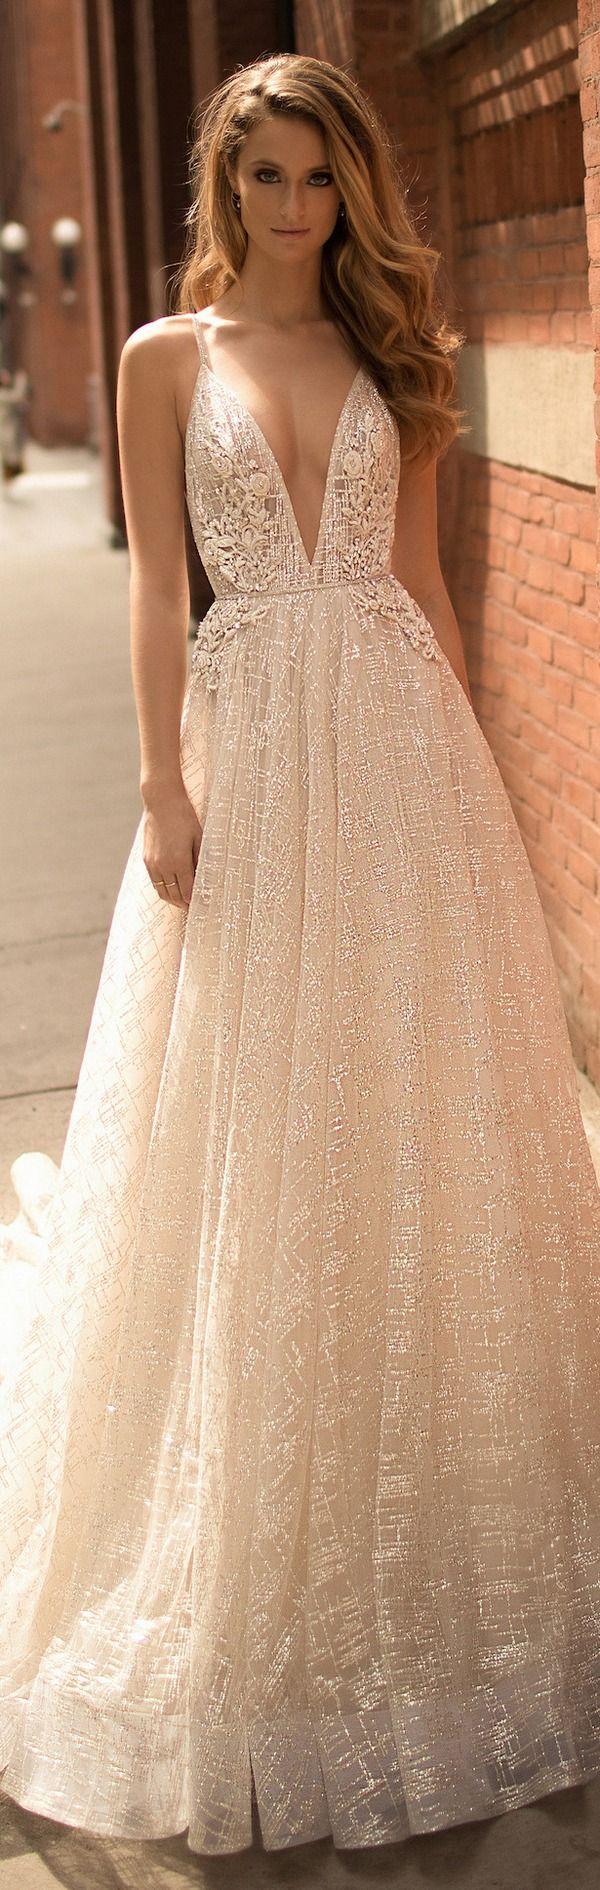 Wedding - Berta Spring Wedding Dresses 2018